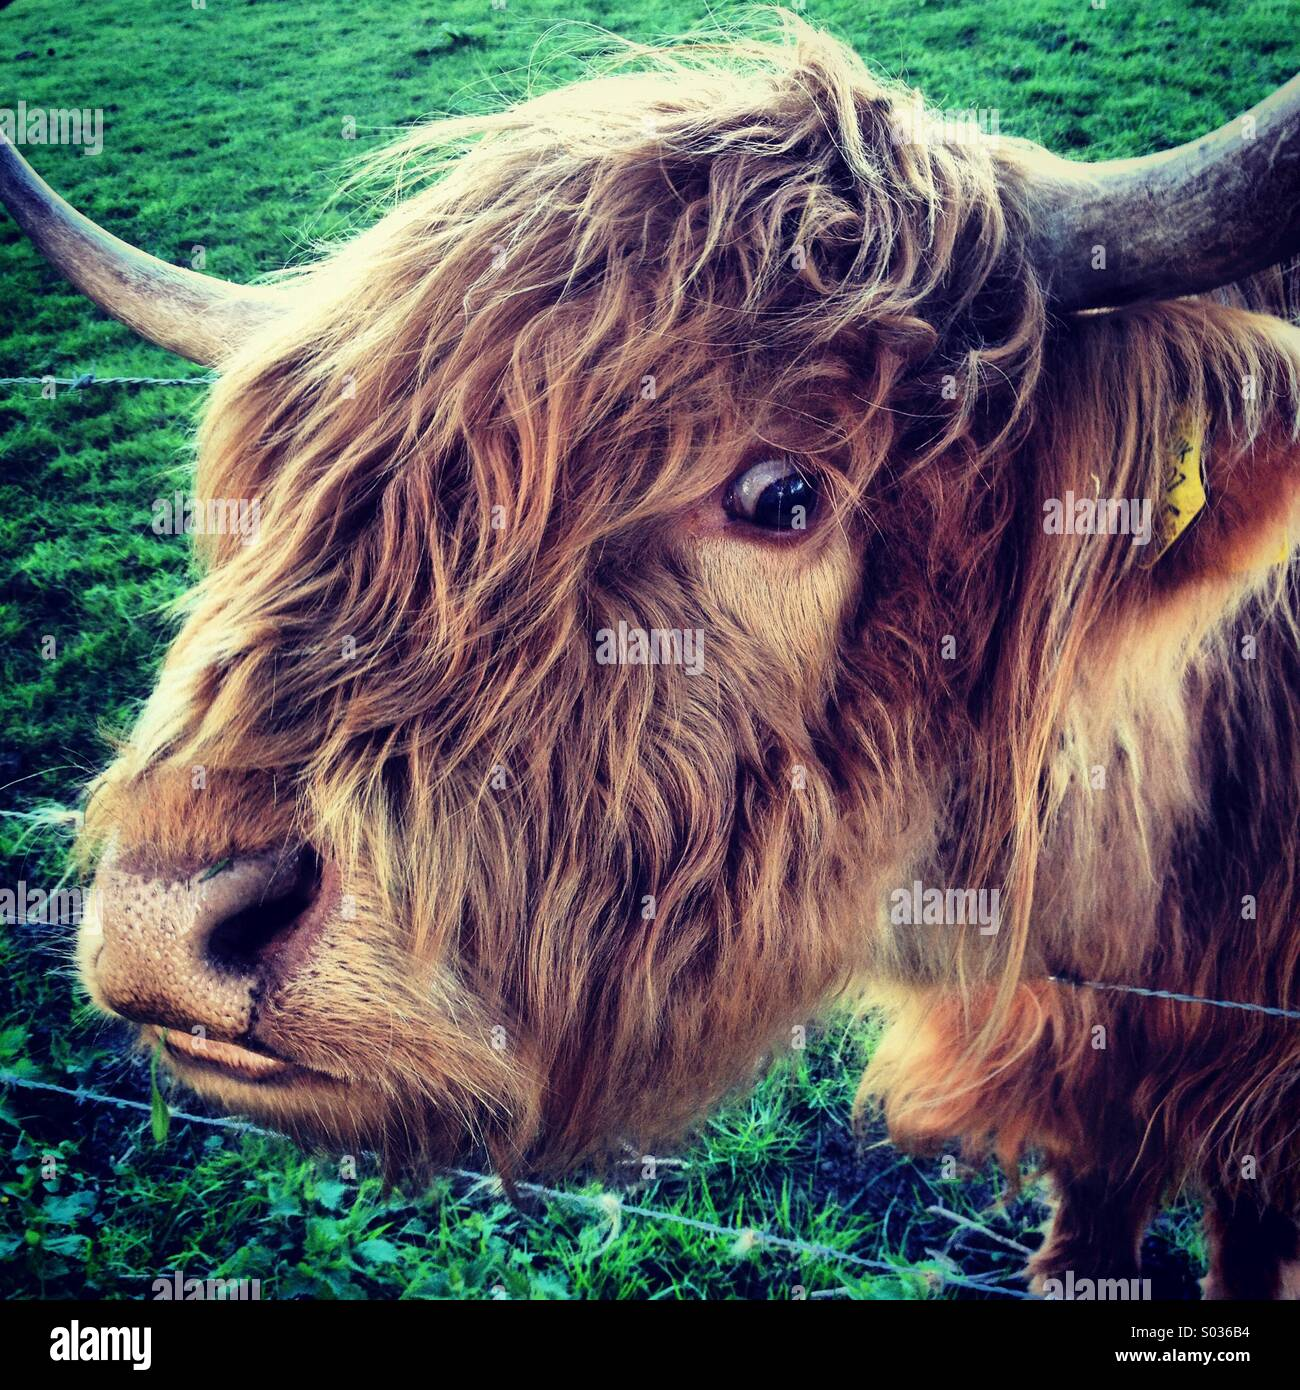 Highland cow, Sutton-under-Brailes, Oxfordshire. - Stock Image